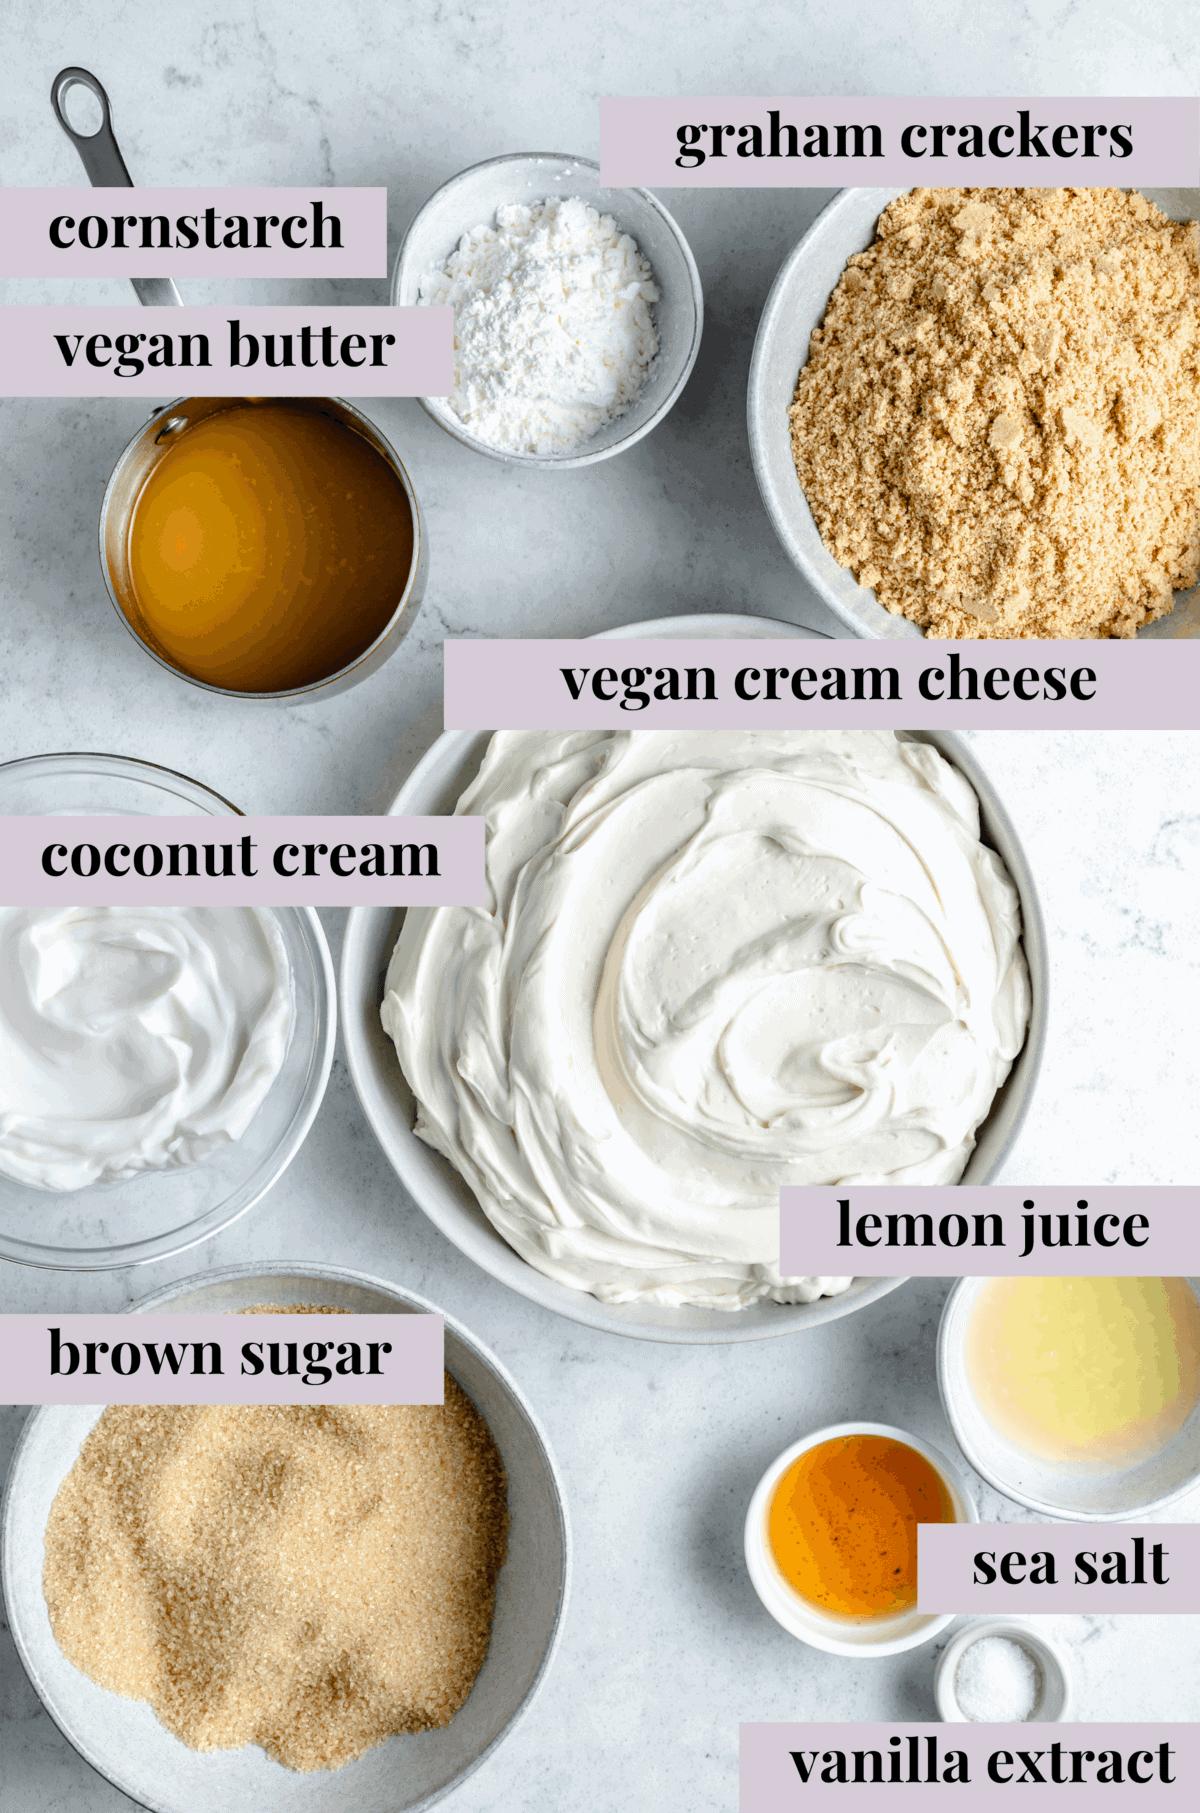 Ingredients for creamy vegan cheesecake.